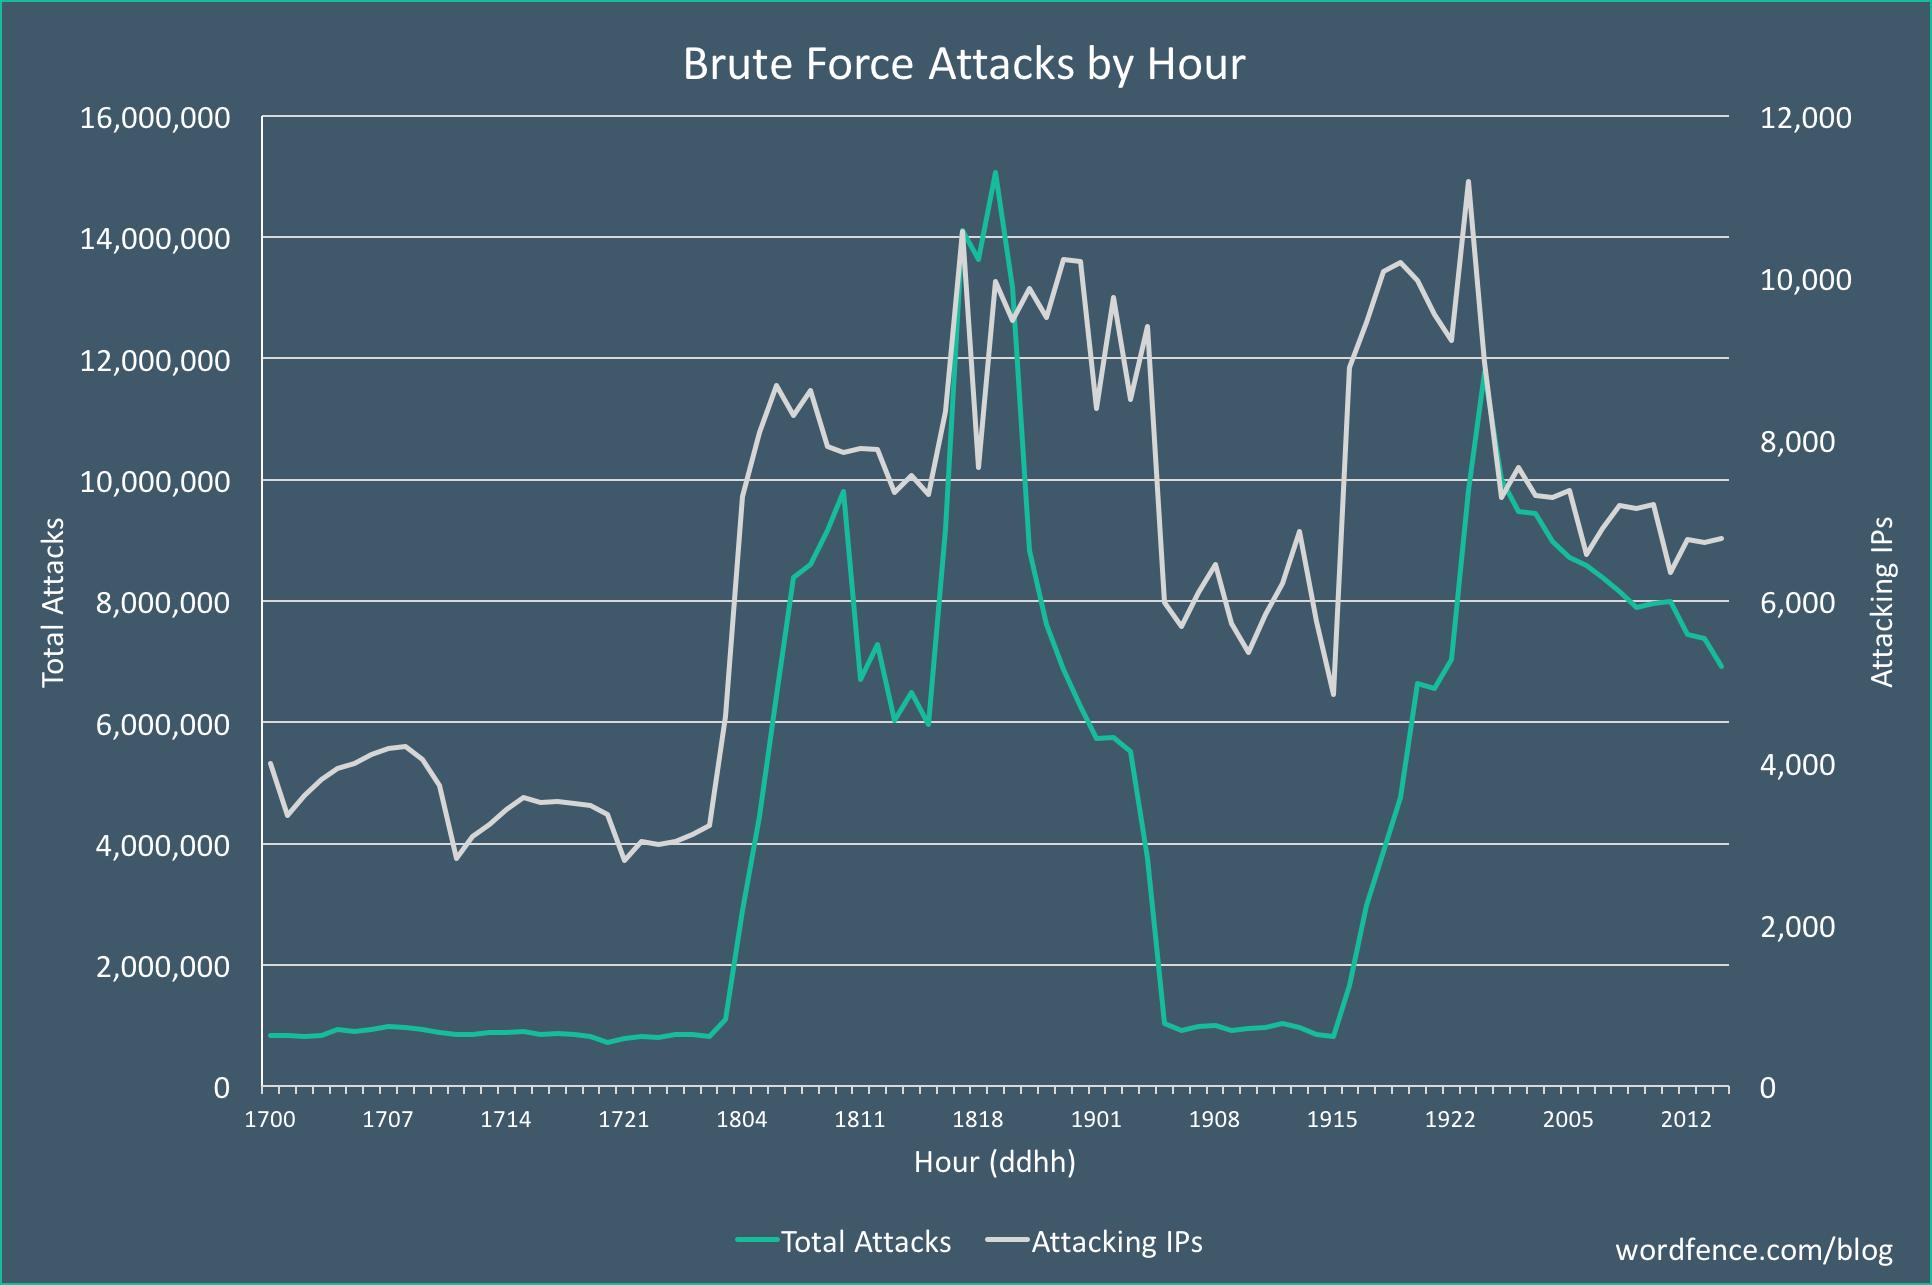 Количество брутфорс-атак по часам